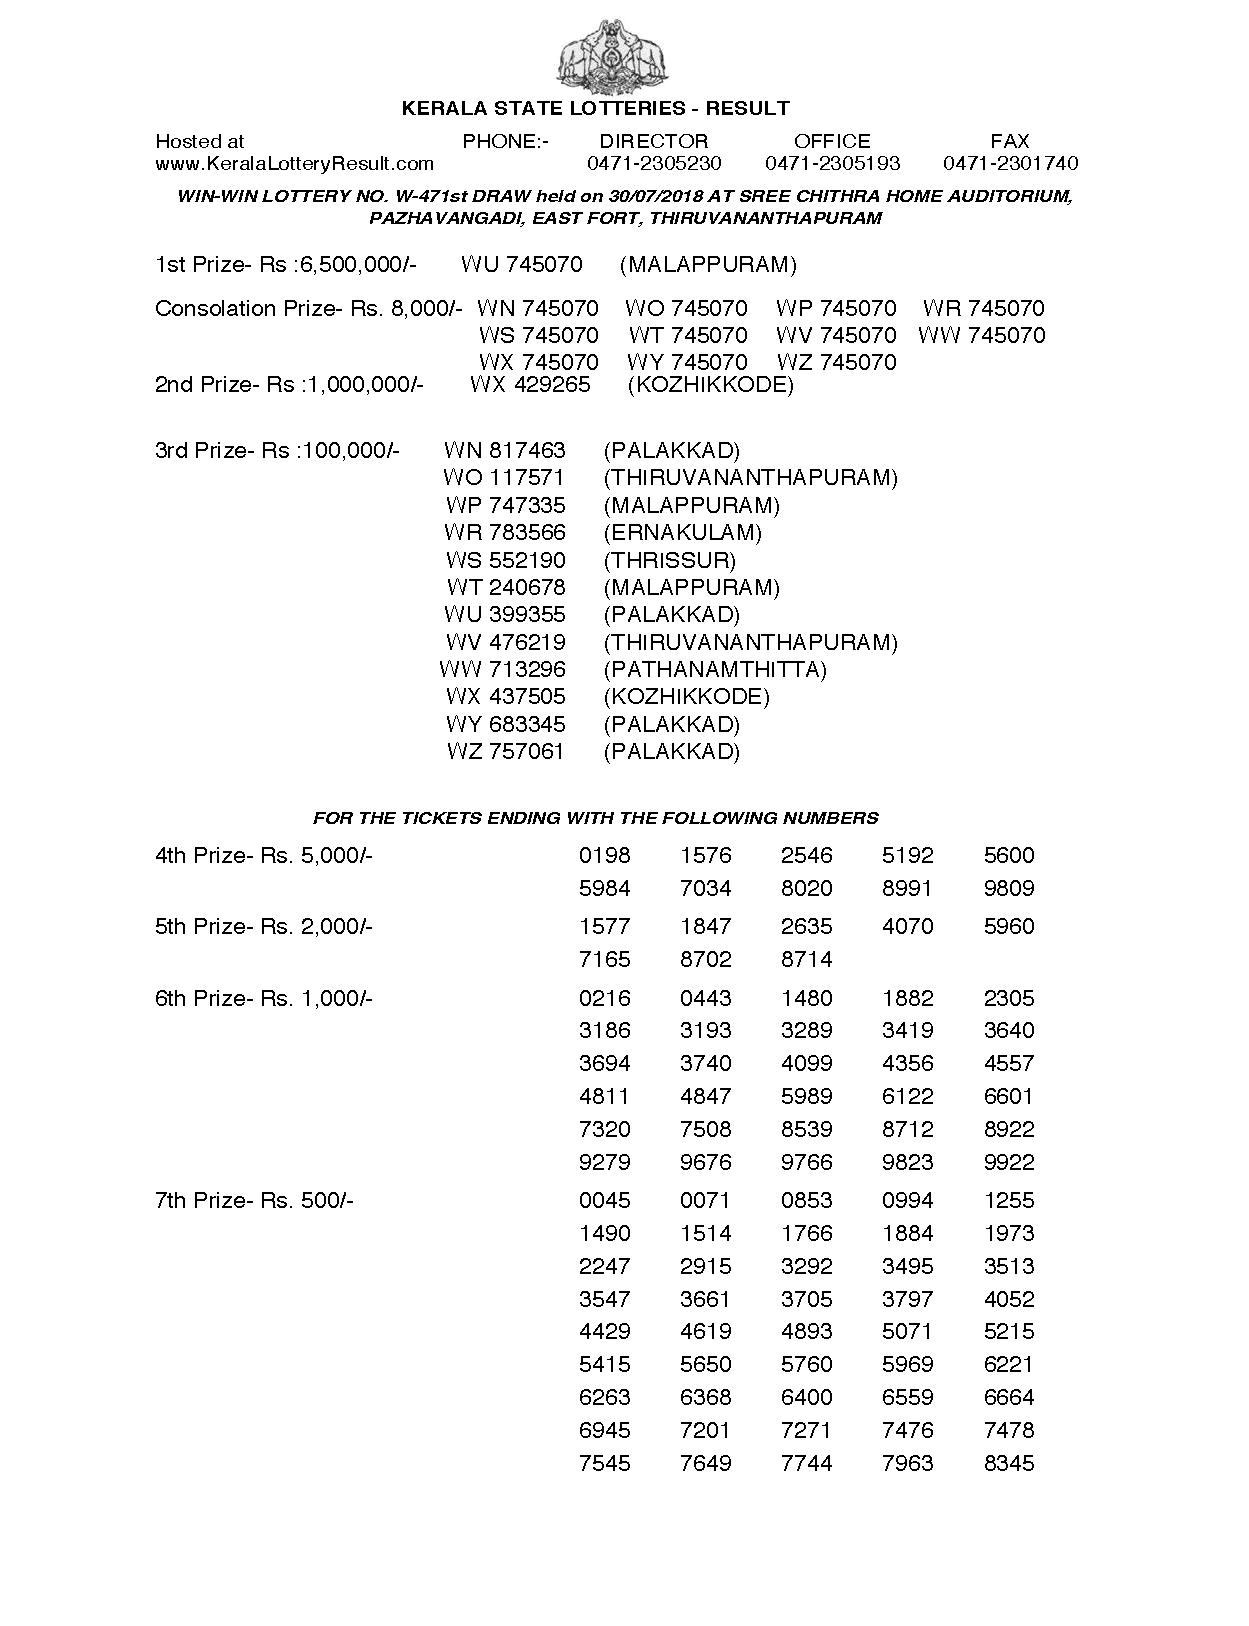 Winwin W471 Kerala Lottery Results Screenshot: Page 1